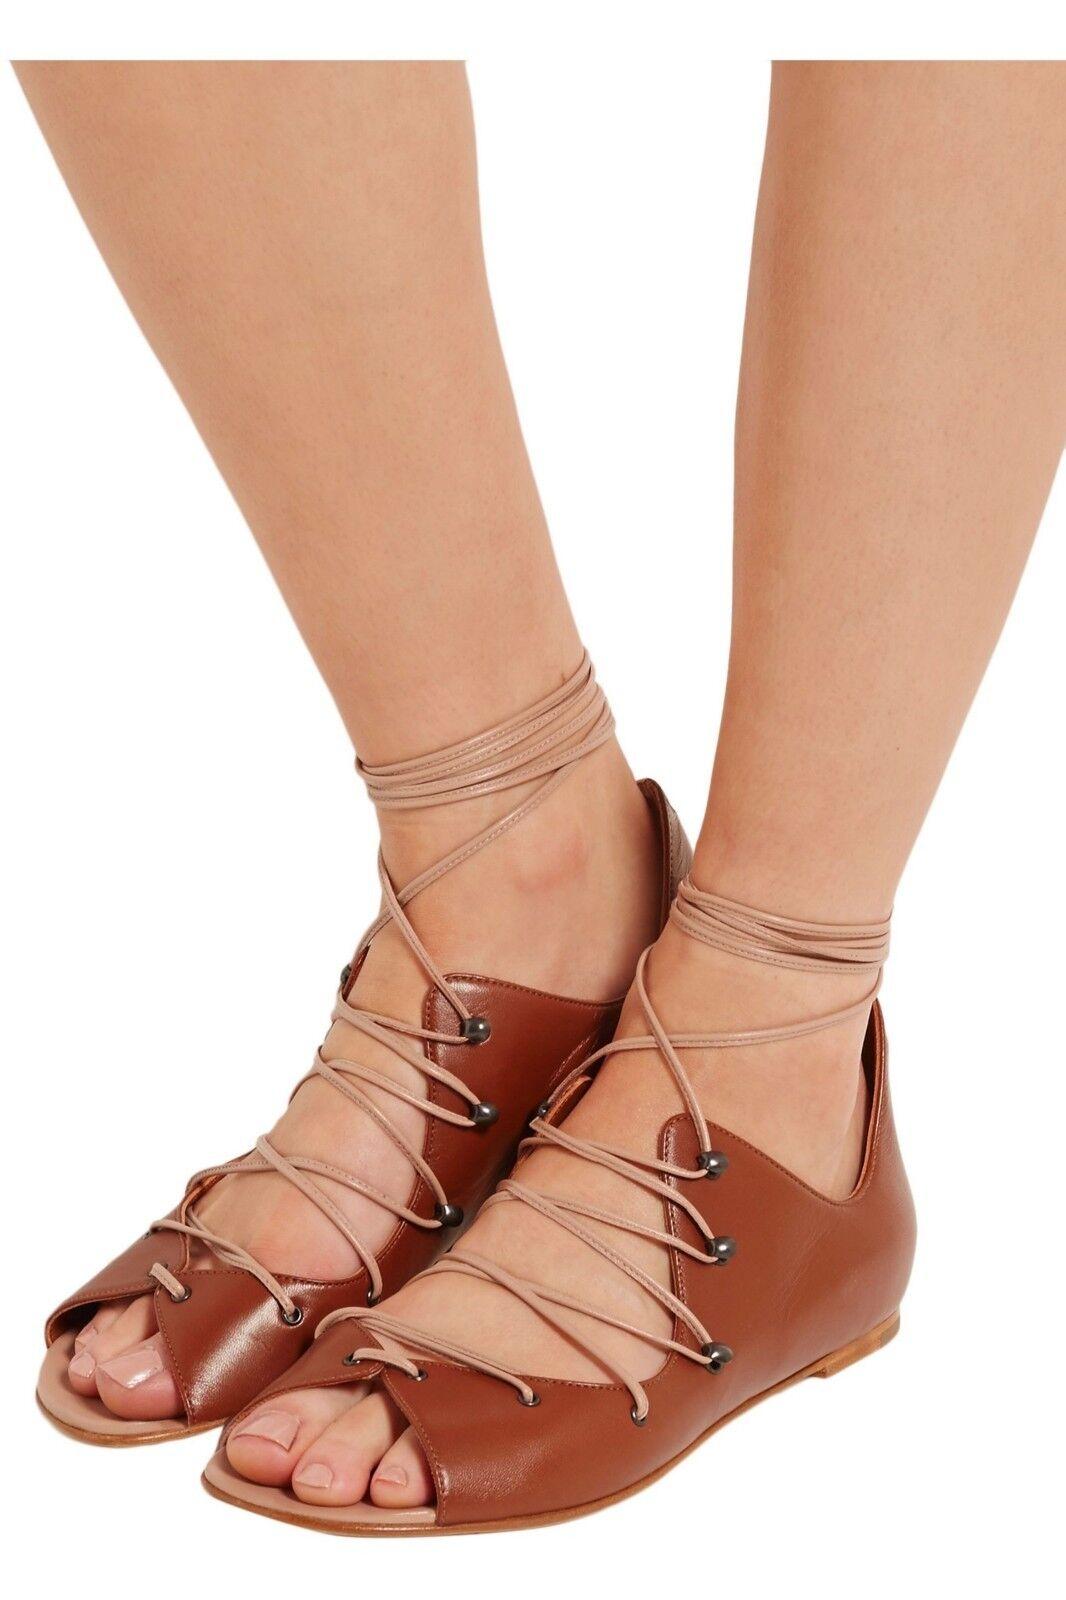 Malone Souliers Savannah lace-up leather sandals Talla EU 36.5 Us 6.5  675